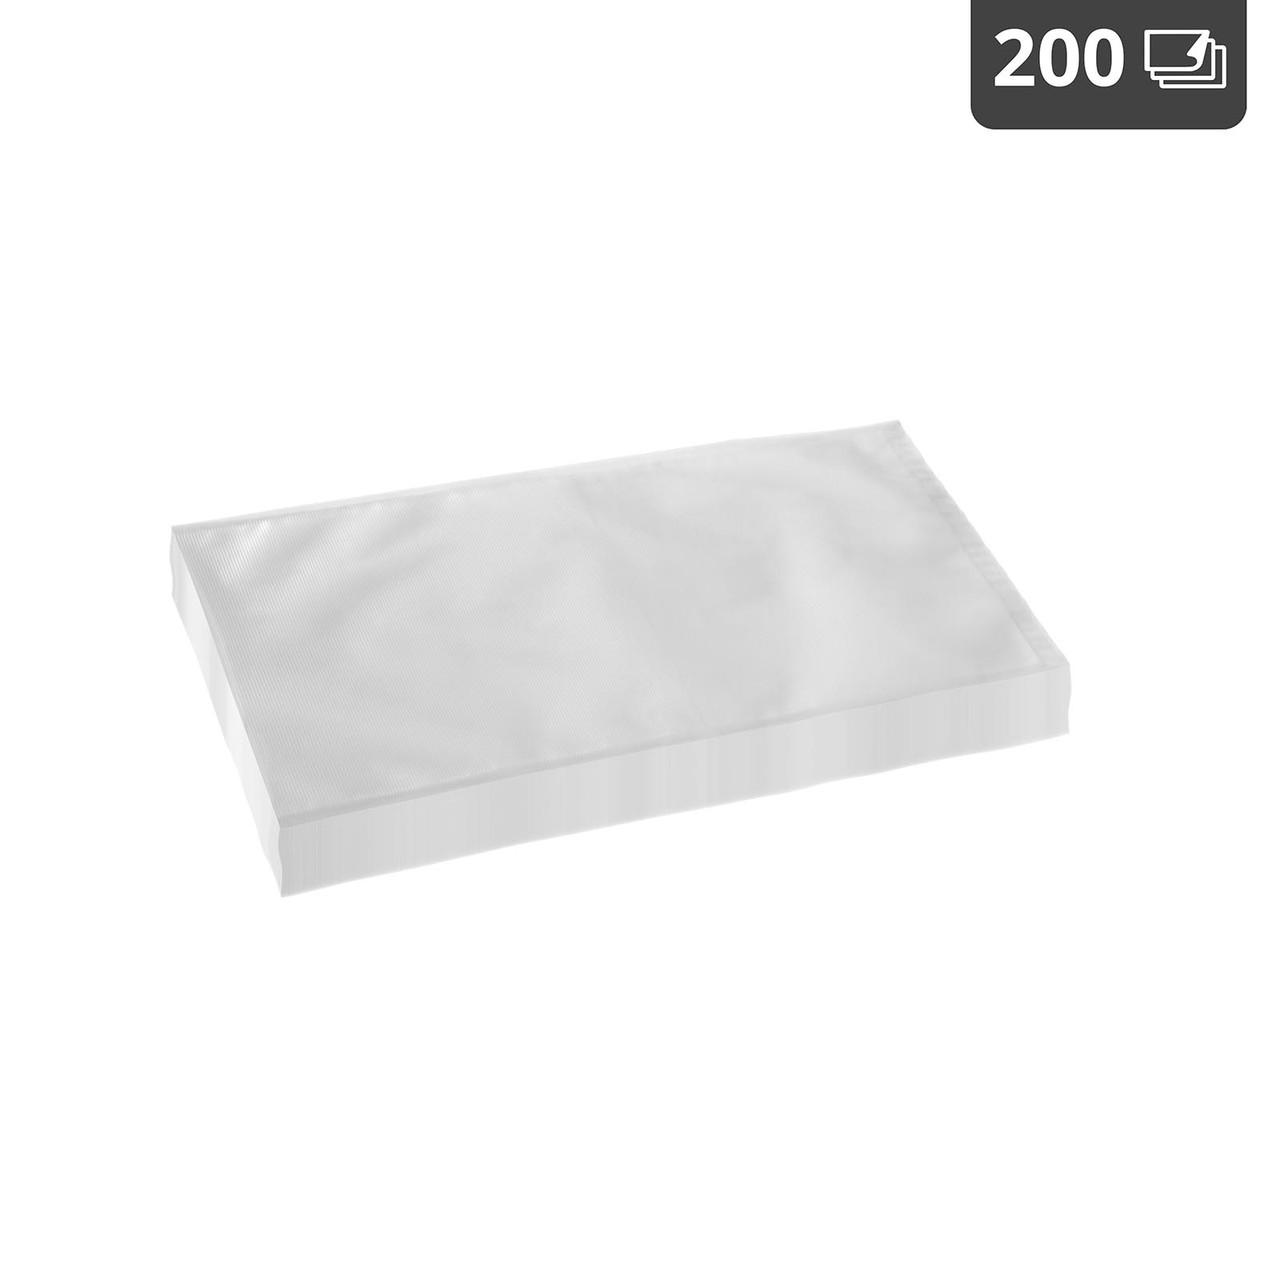 Пакеты с накаткой для вакуумной упаковки - 200 шт. - 20 х 30 см. Royal Catering